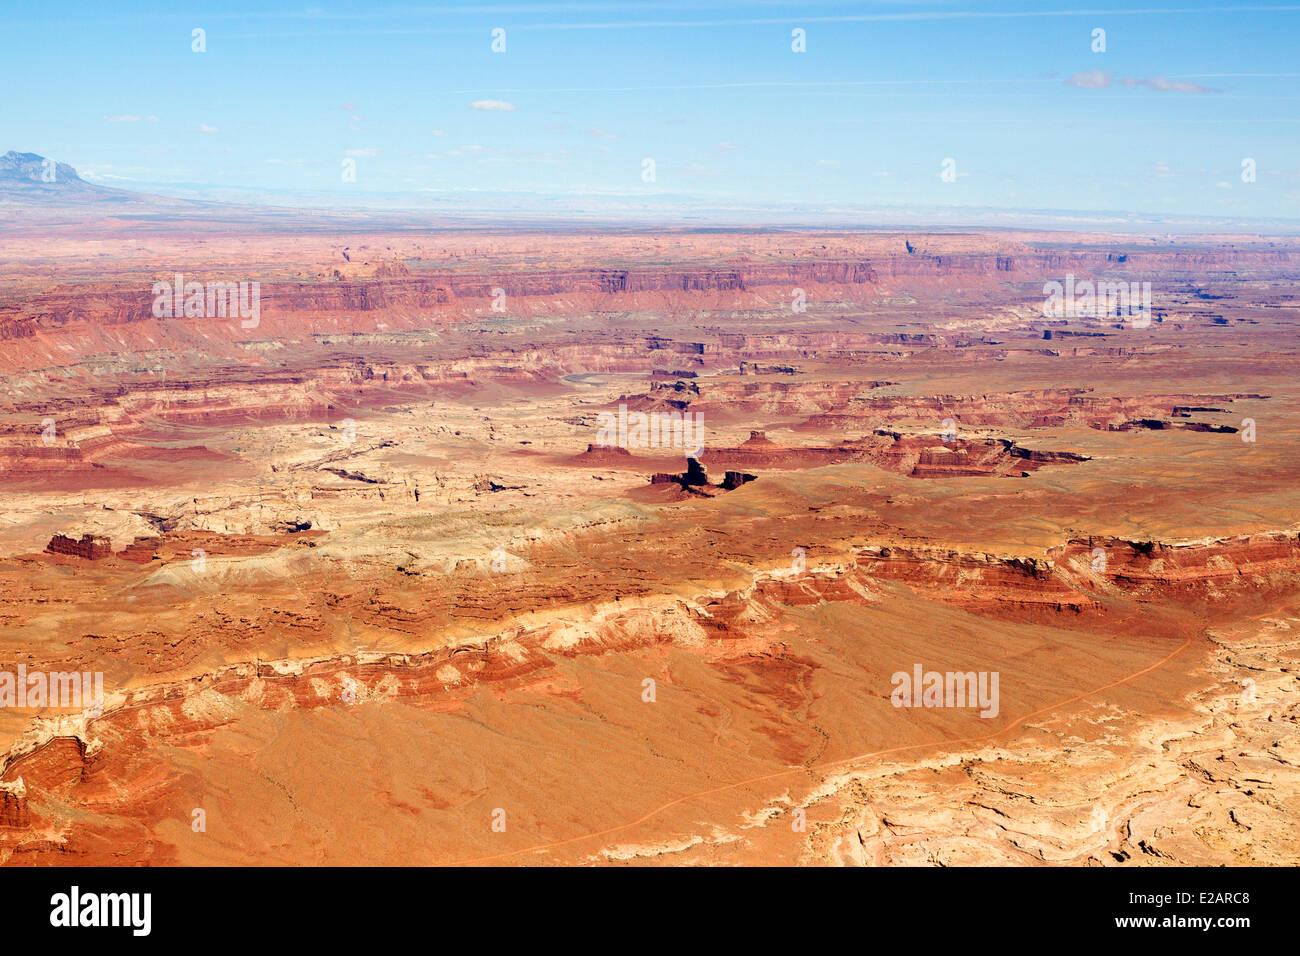 United States, Utah, Canyonland National Park (aerial view) - Stock Image